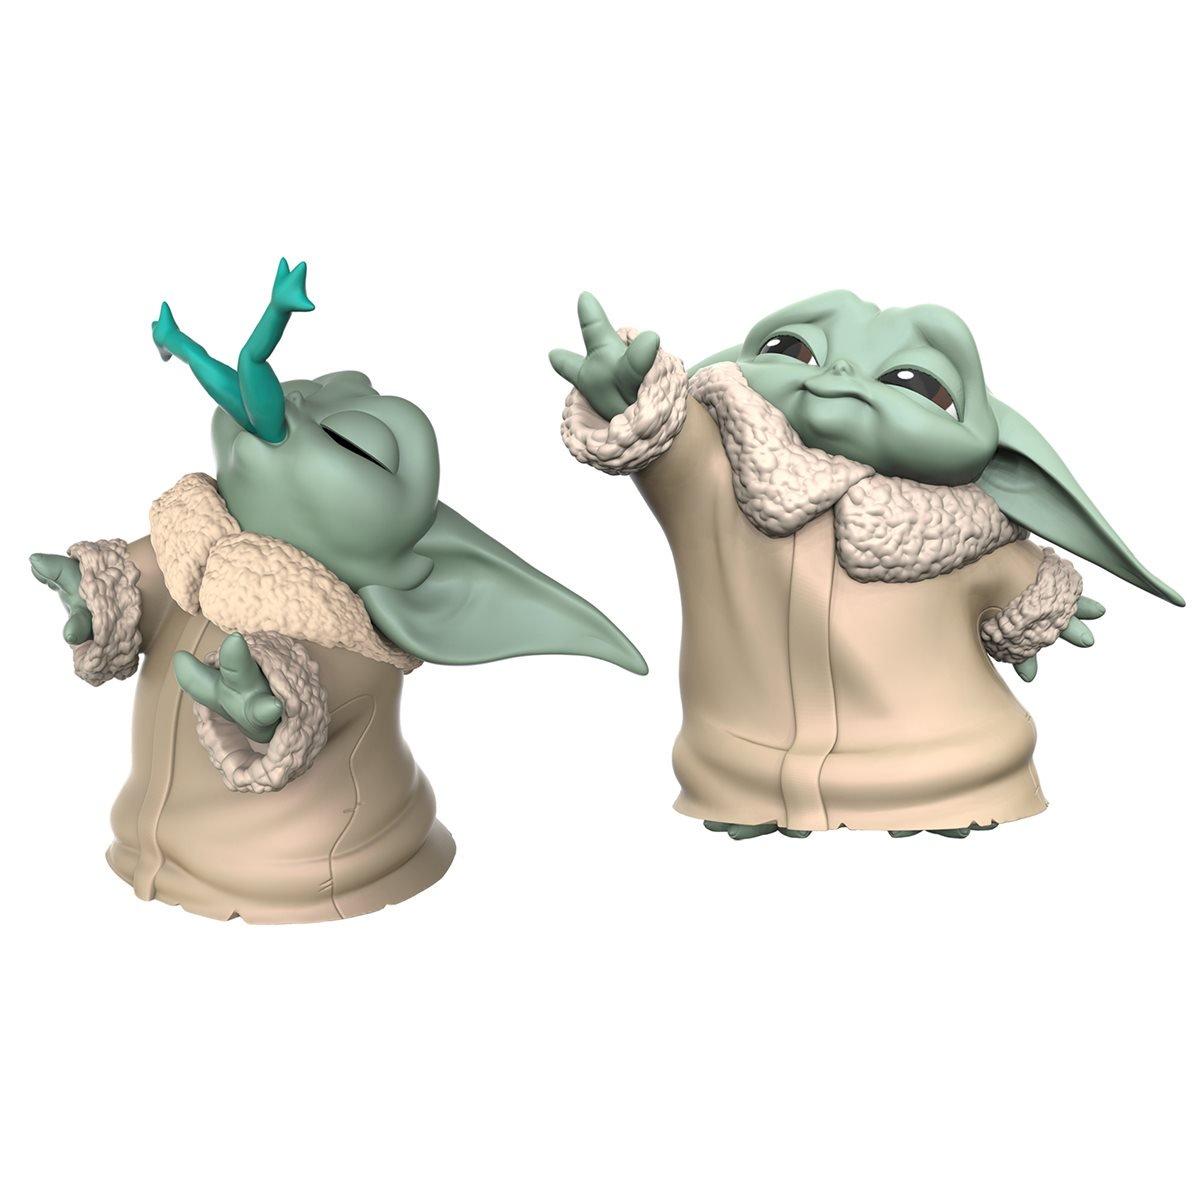 Hasbro - Star Wars - The Mandalorian - Baby Yoda - Baby Bounties Frog and Force Mini-Figures - 01